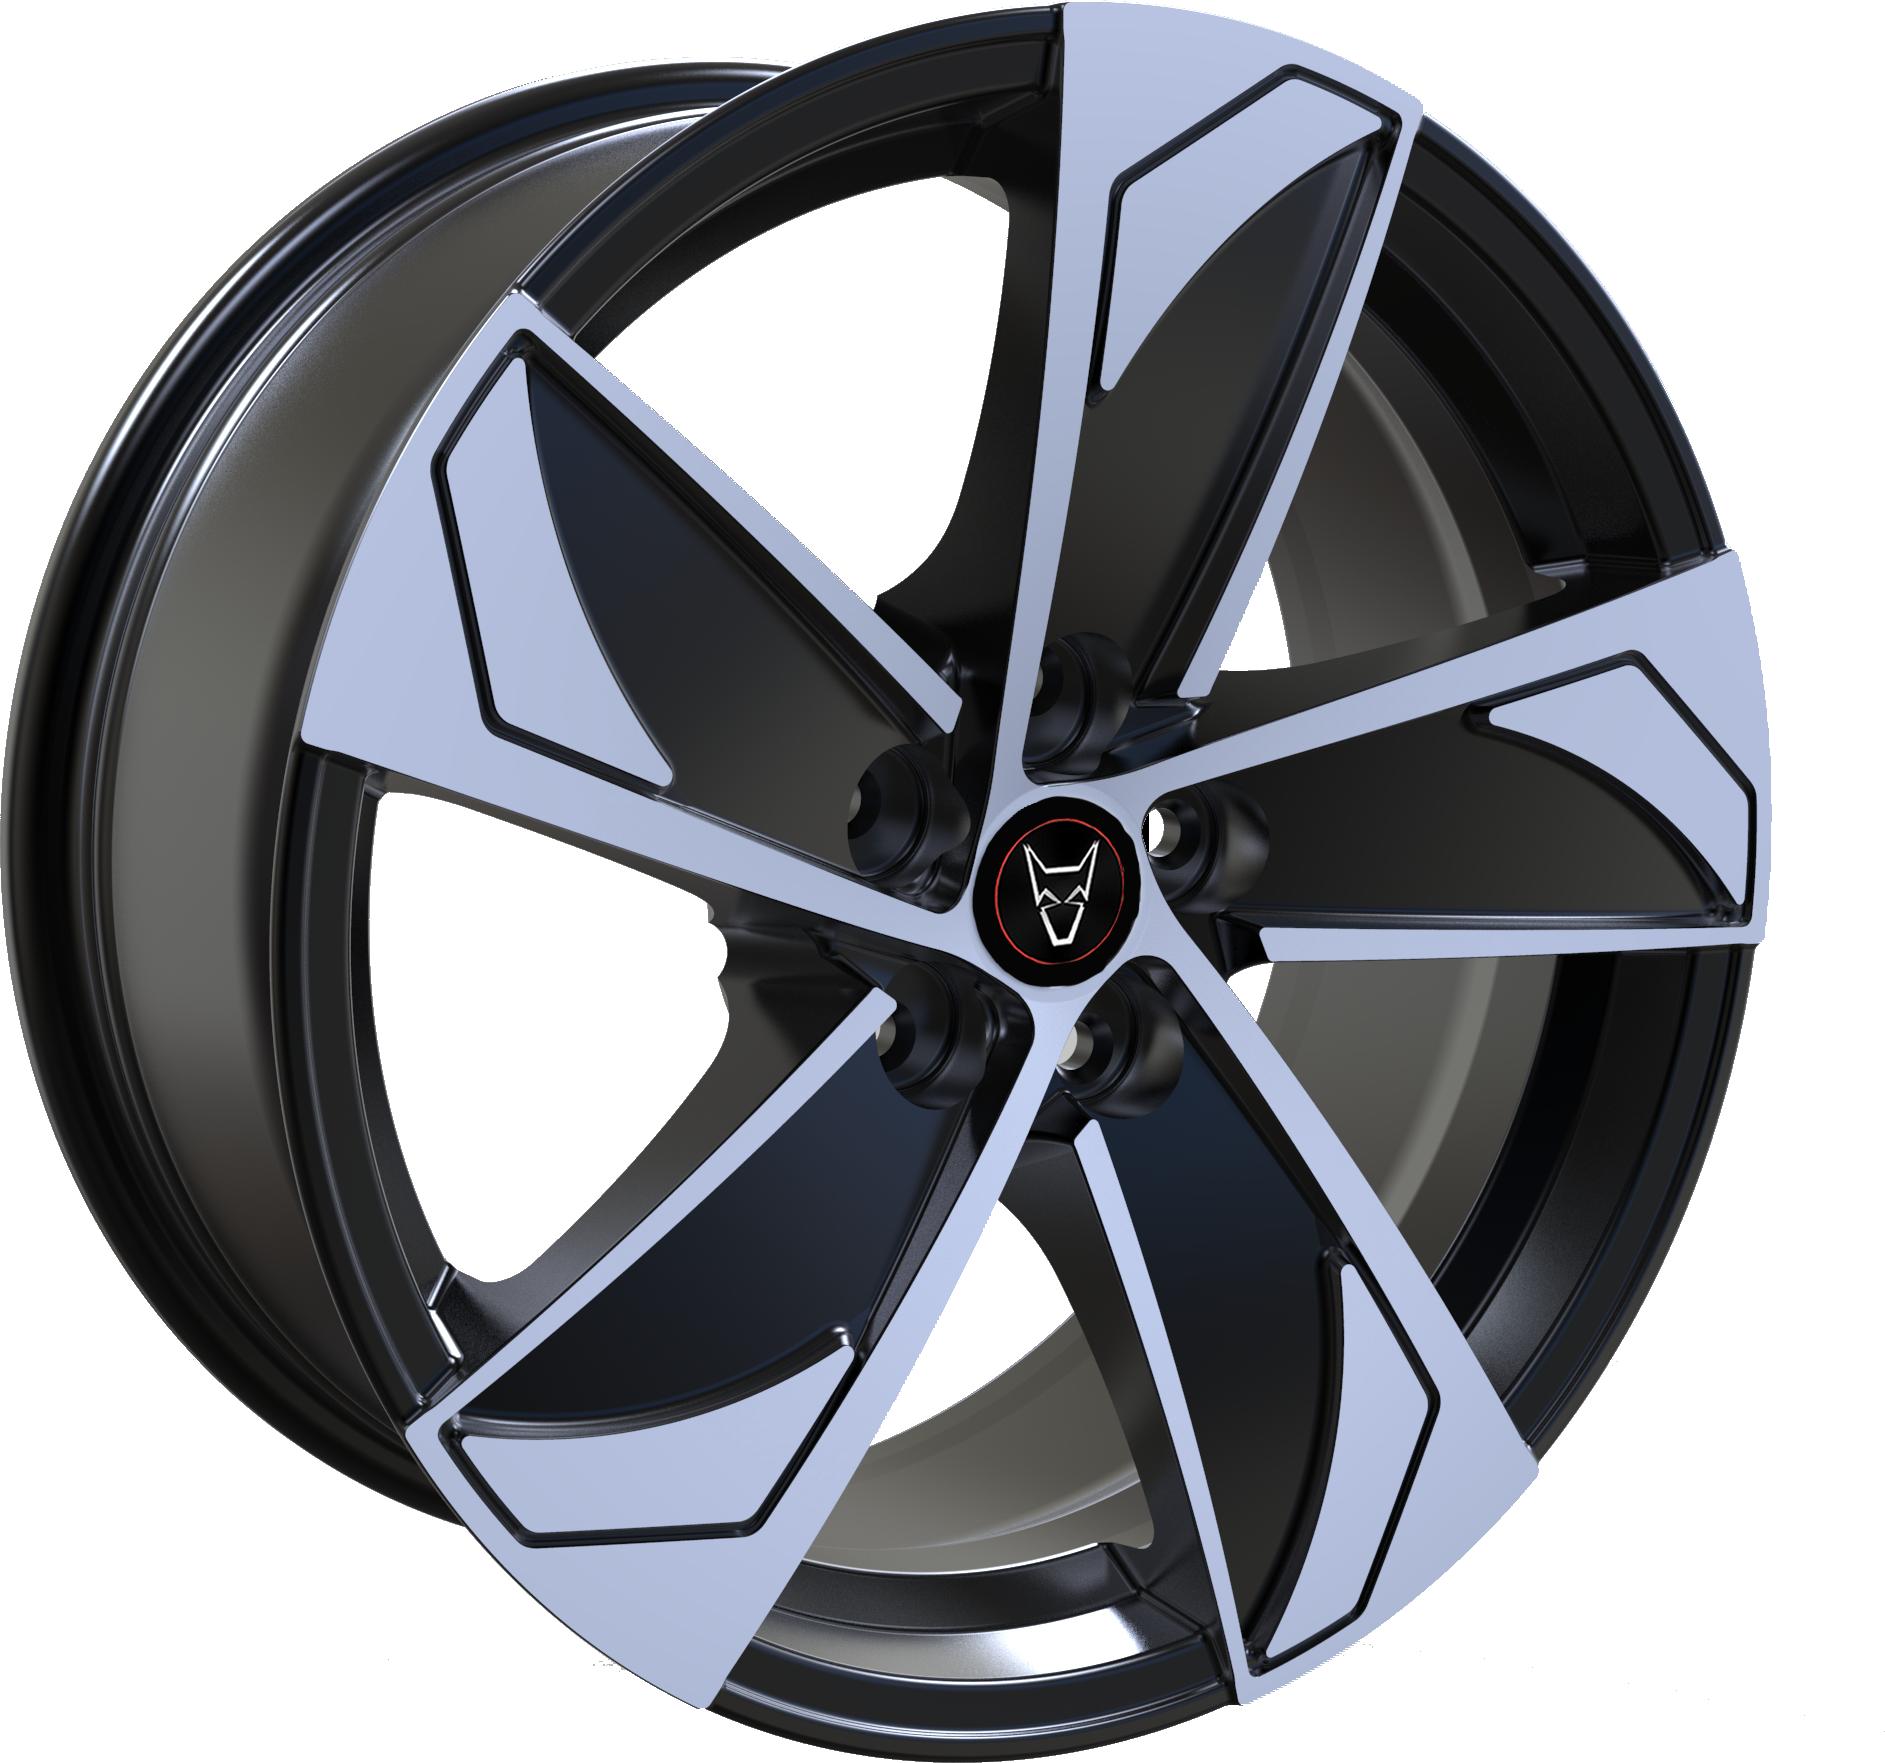 Demon Wheels Eurosport AD5 Gloss Black / Polished